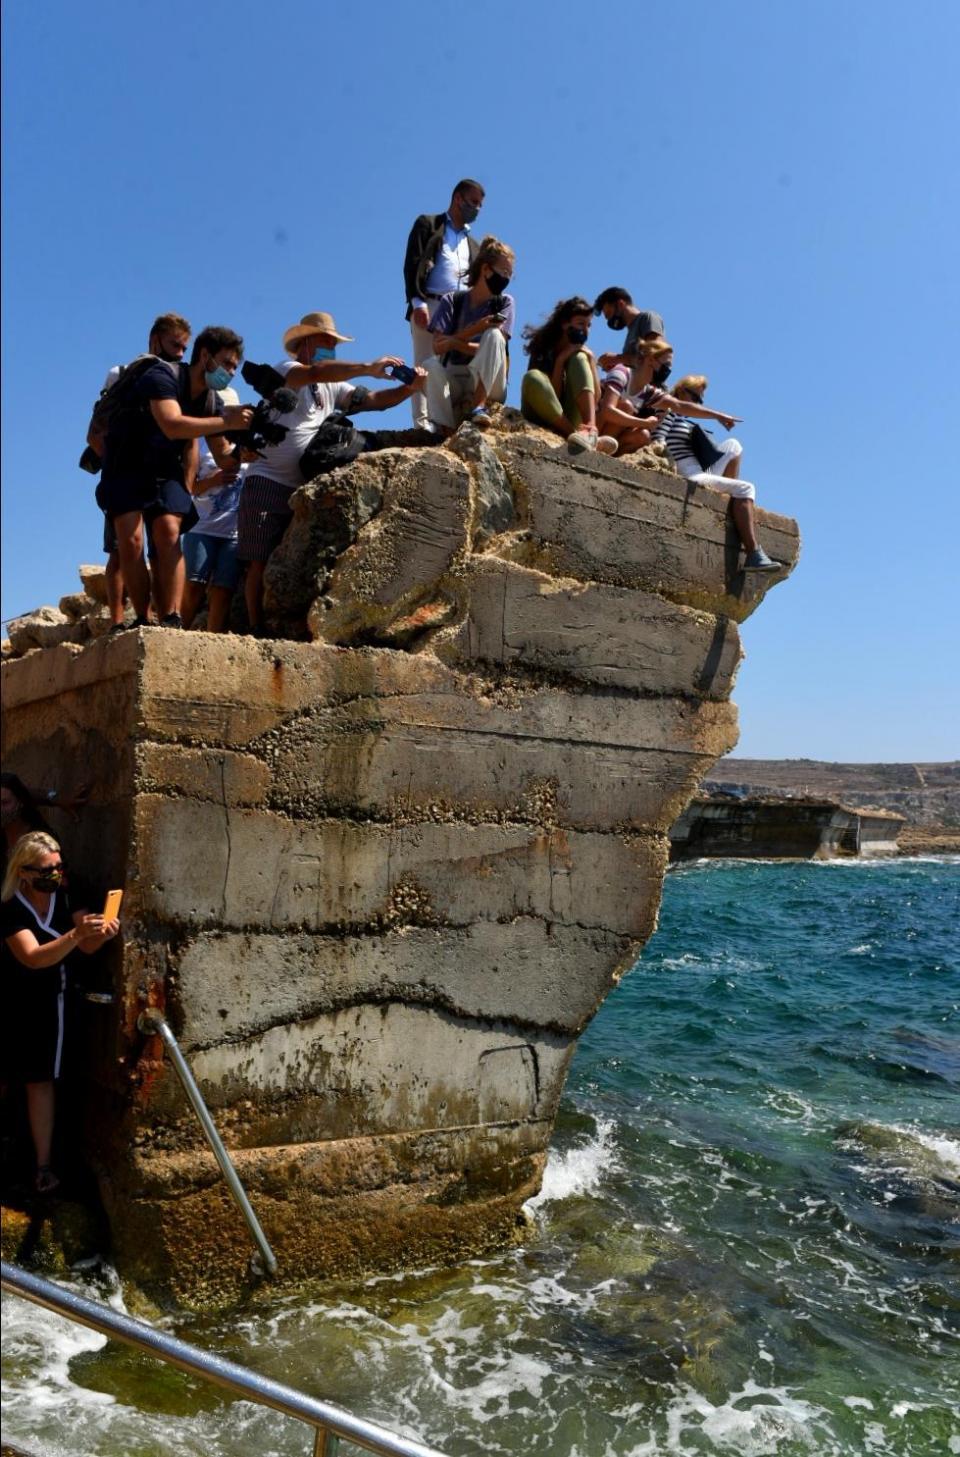 Onlookers take photos as Kim is released into the wild. Photo: Chris Sant Fournier